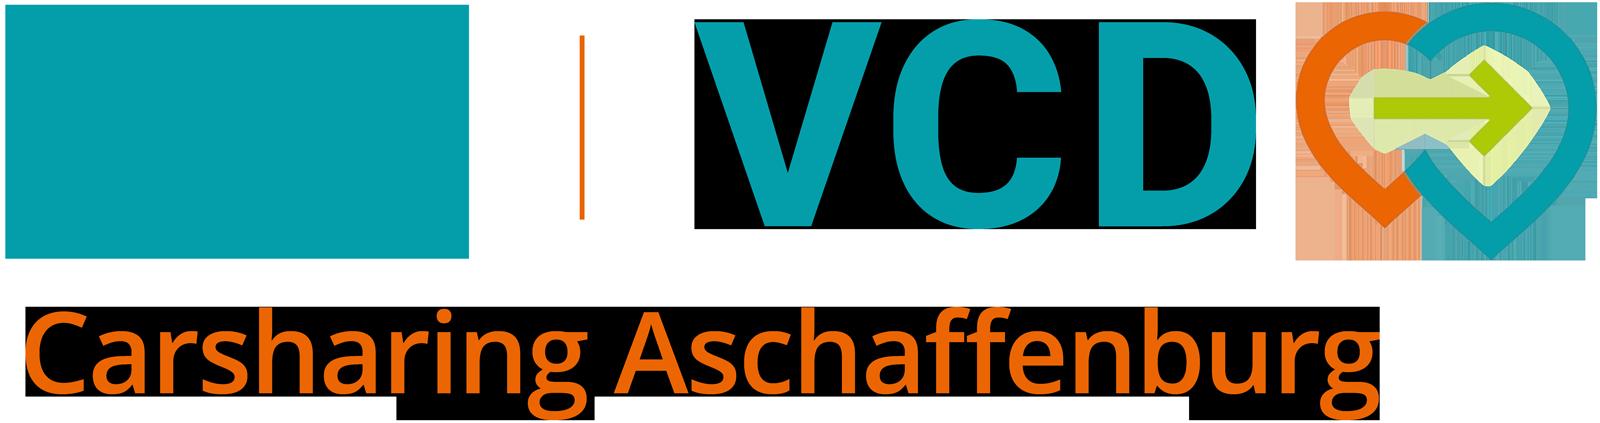 Carsharing Aschaffenburg